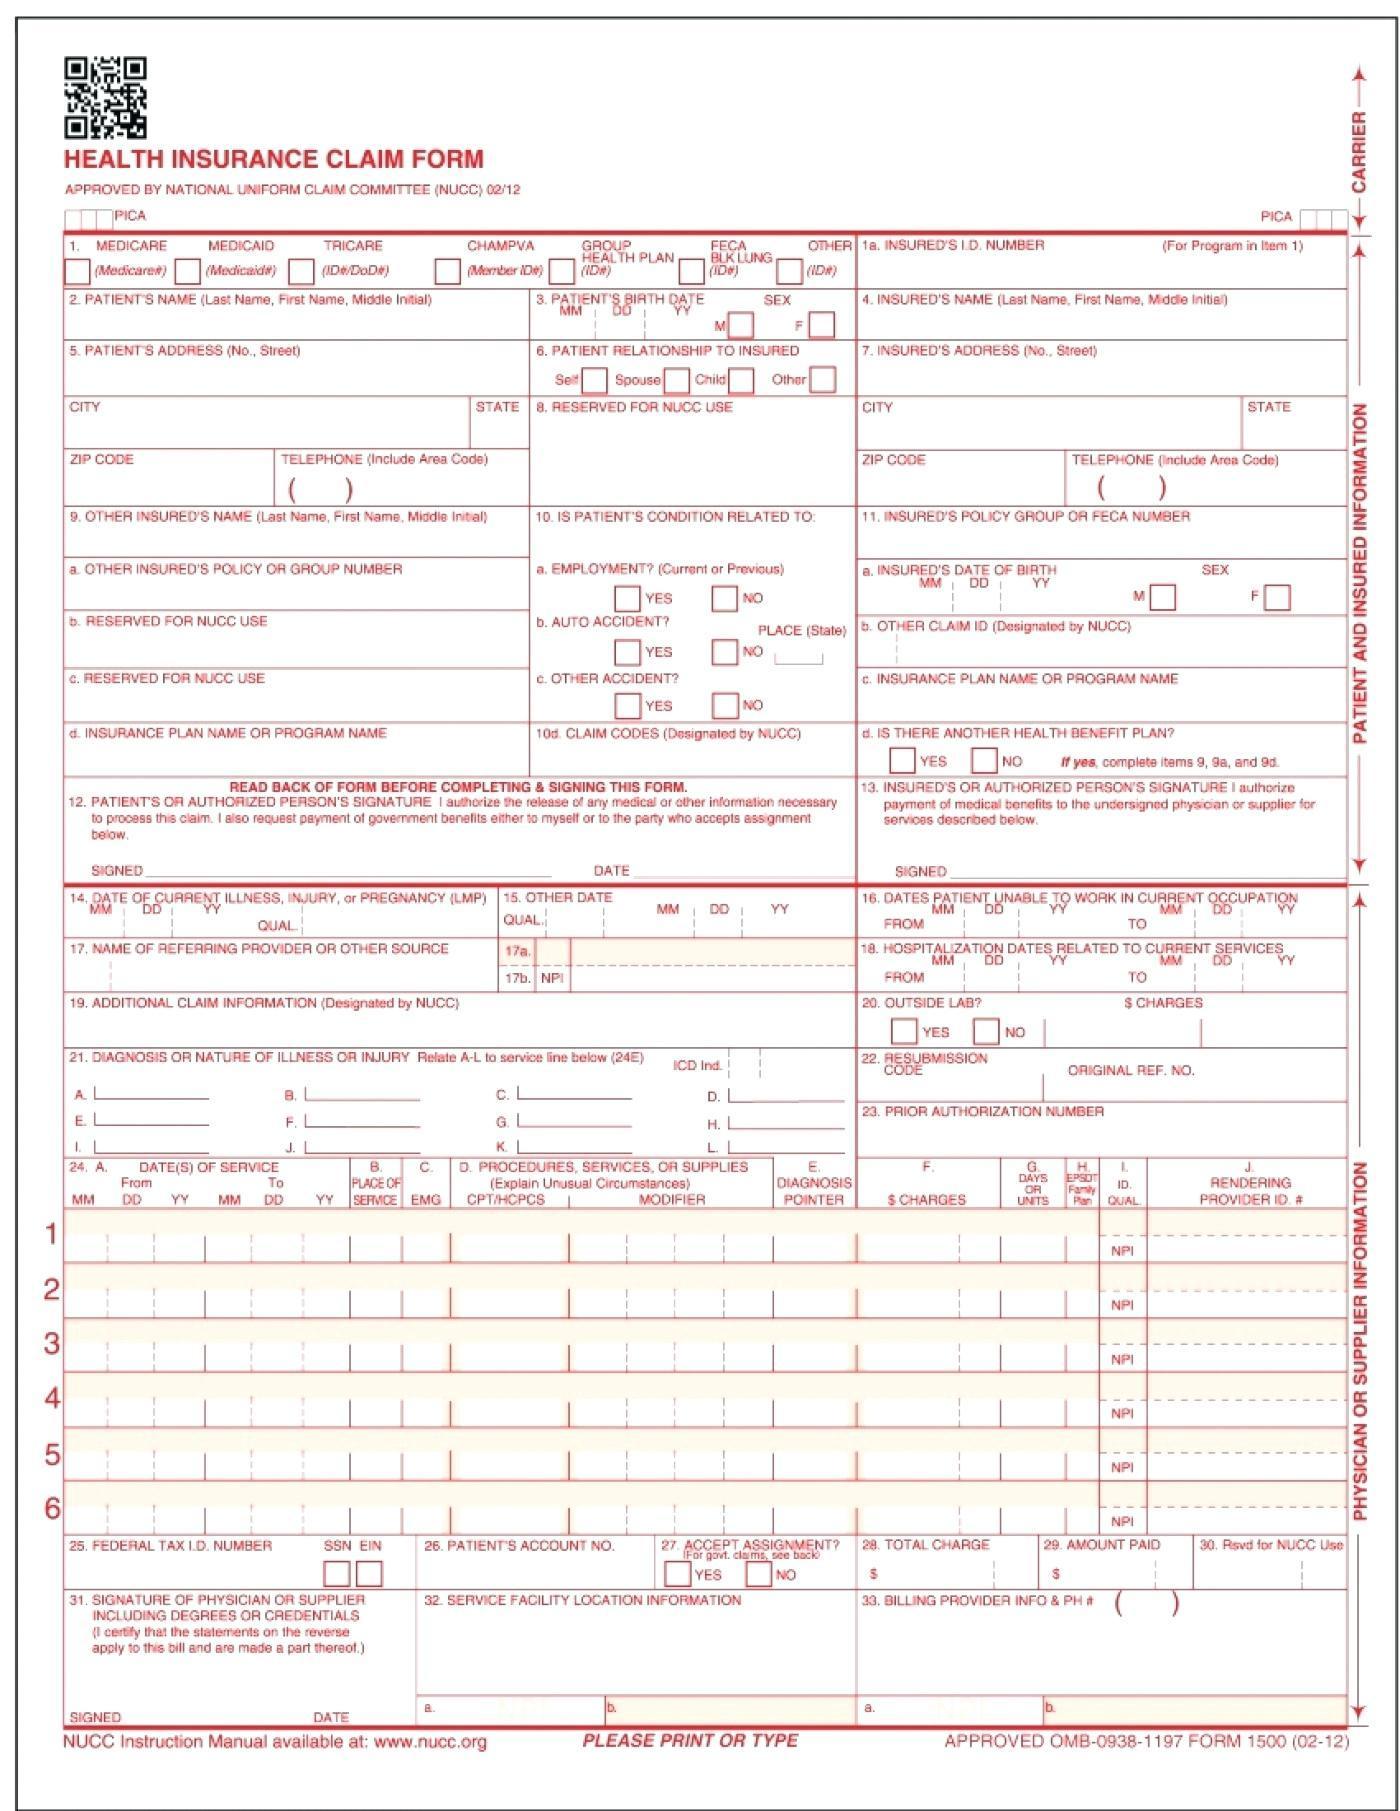 New Cms 1500 Form Pdf